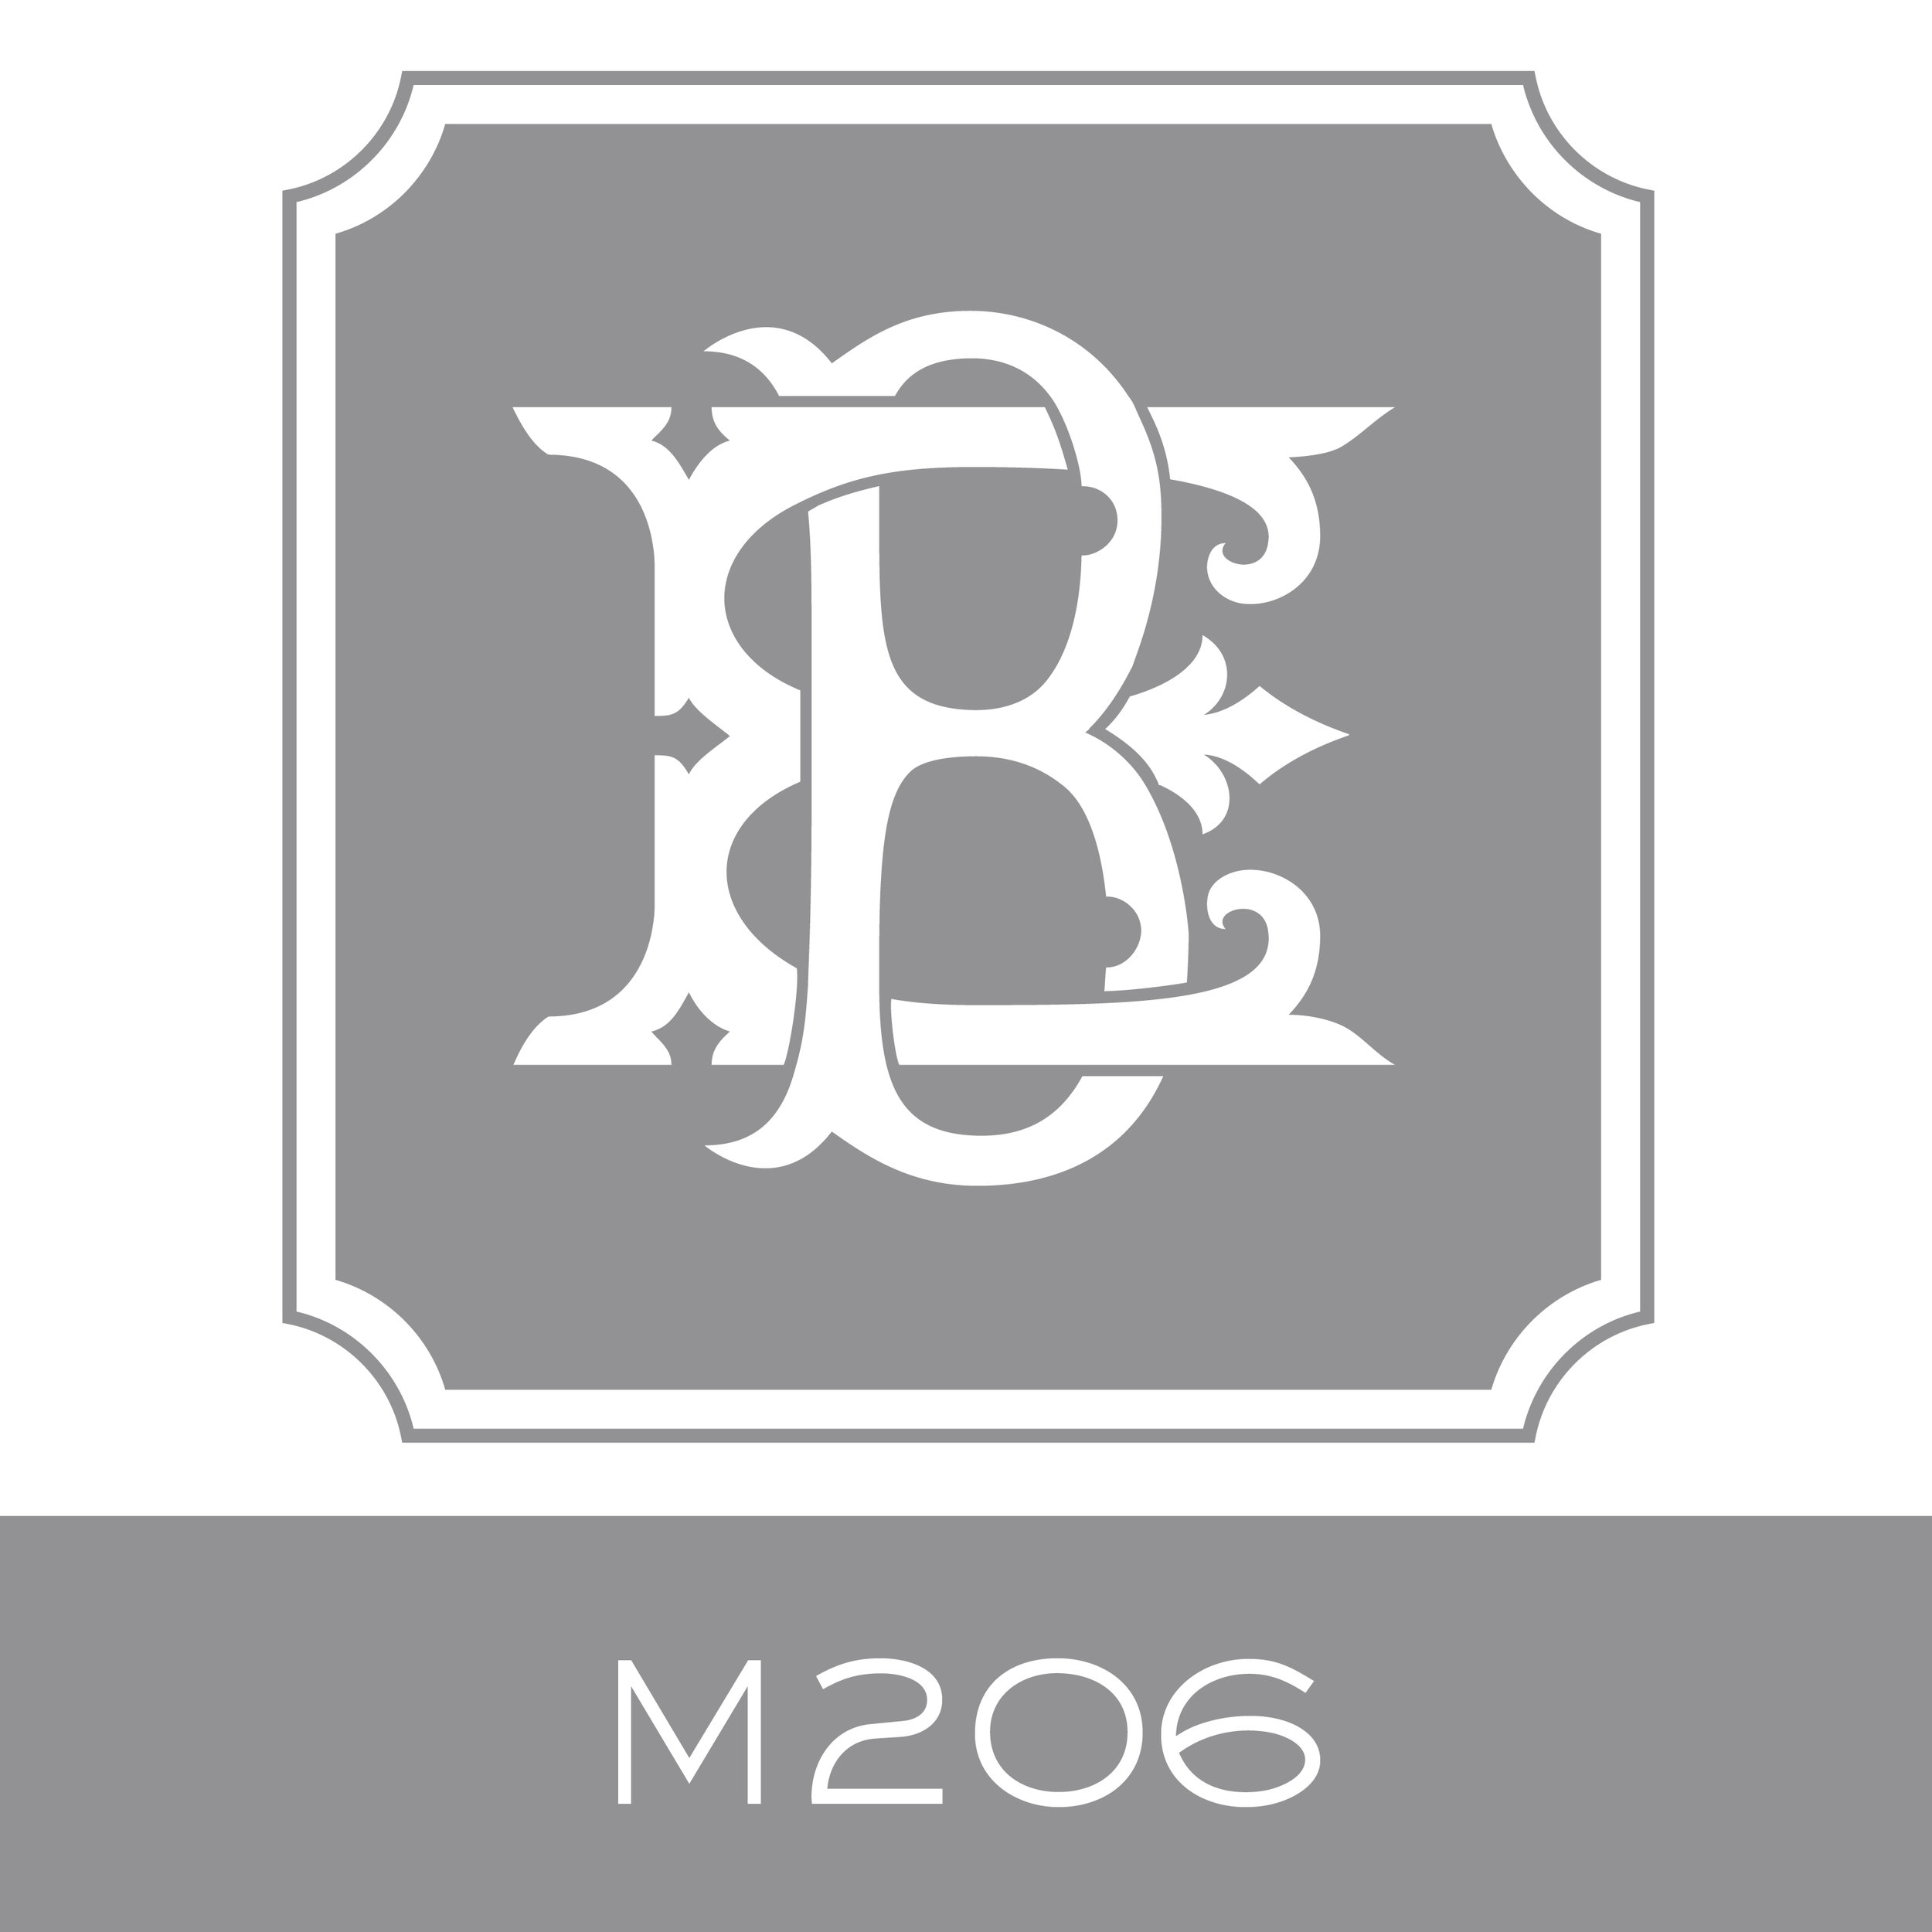 M206.jpg